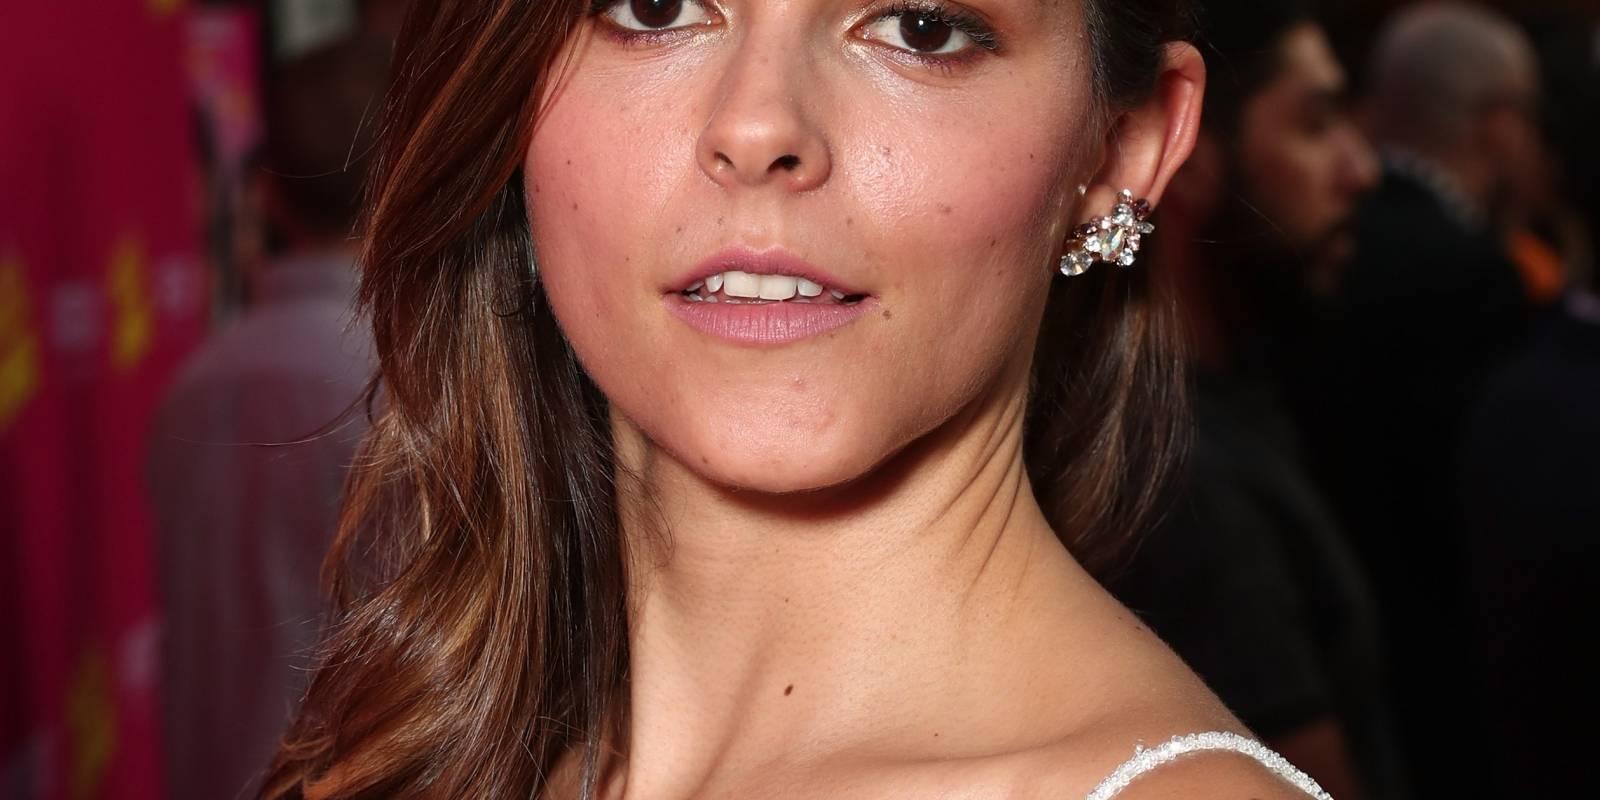 La actriz colombiana Julieth Restrepo.